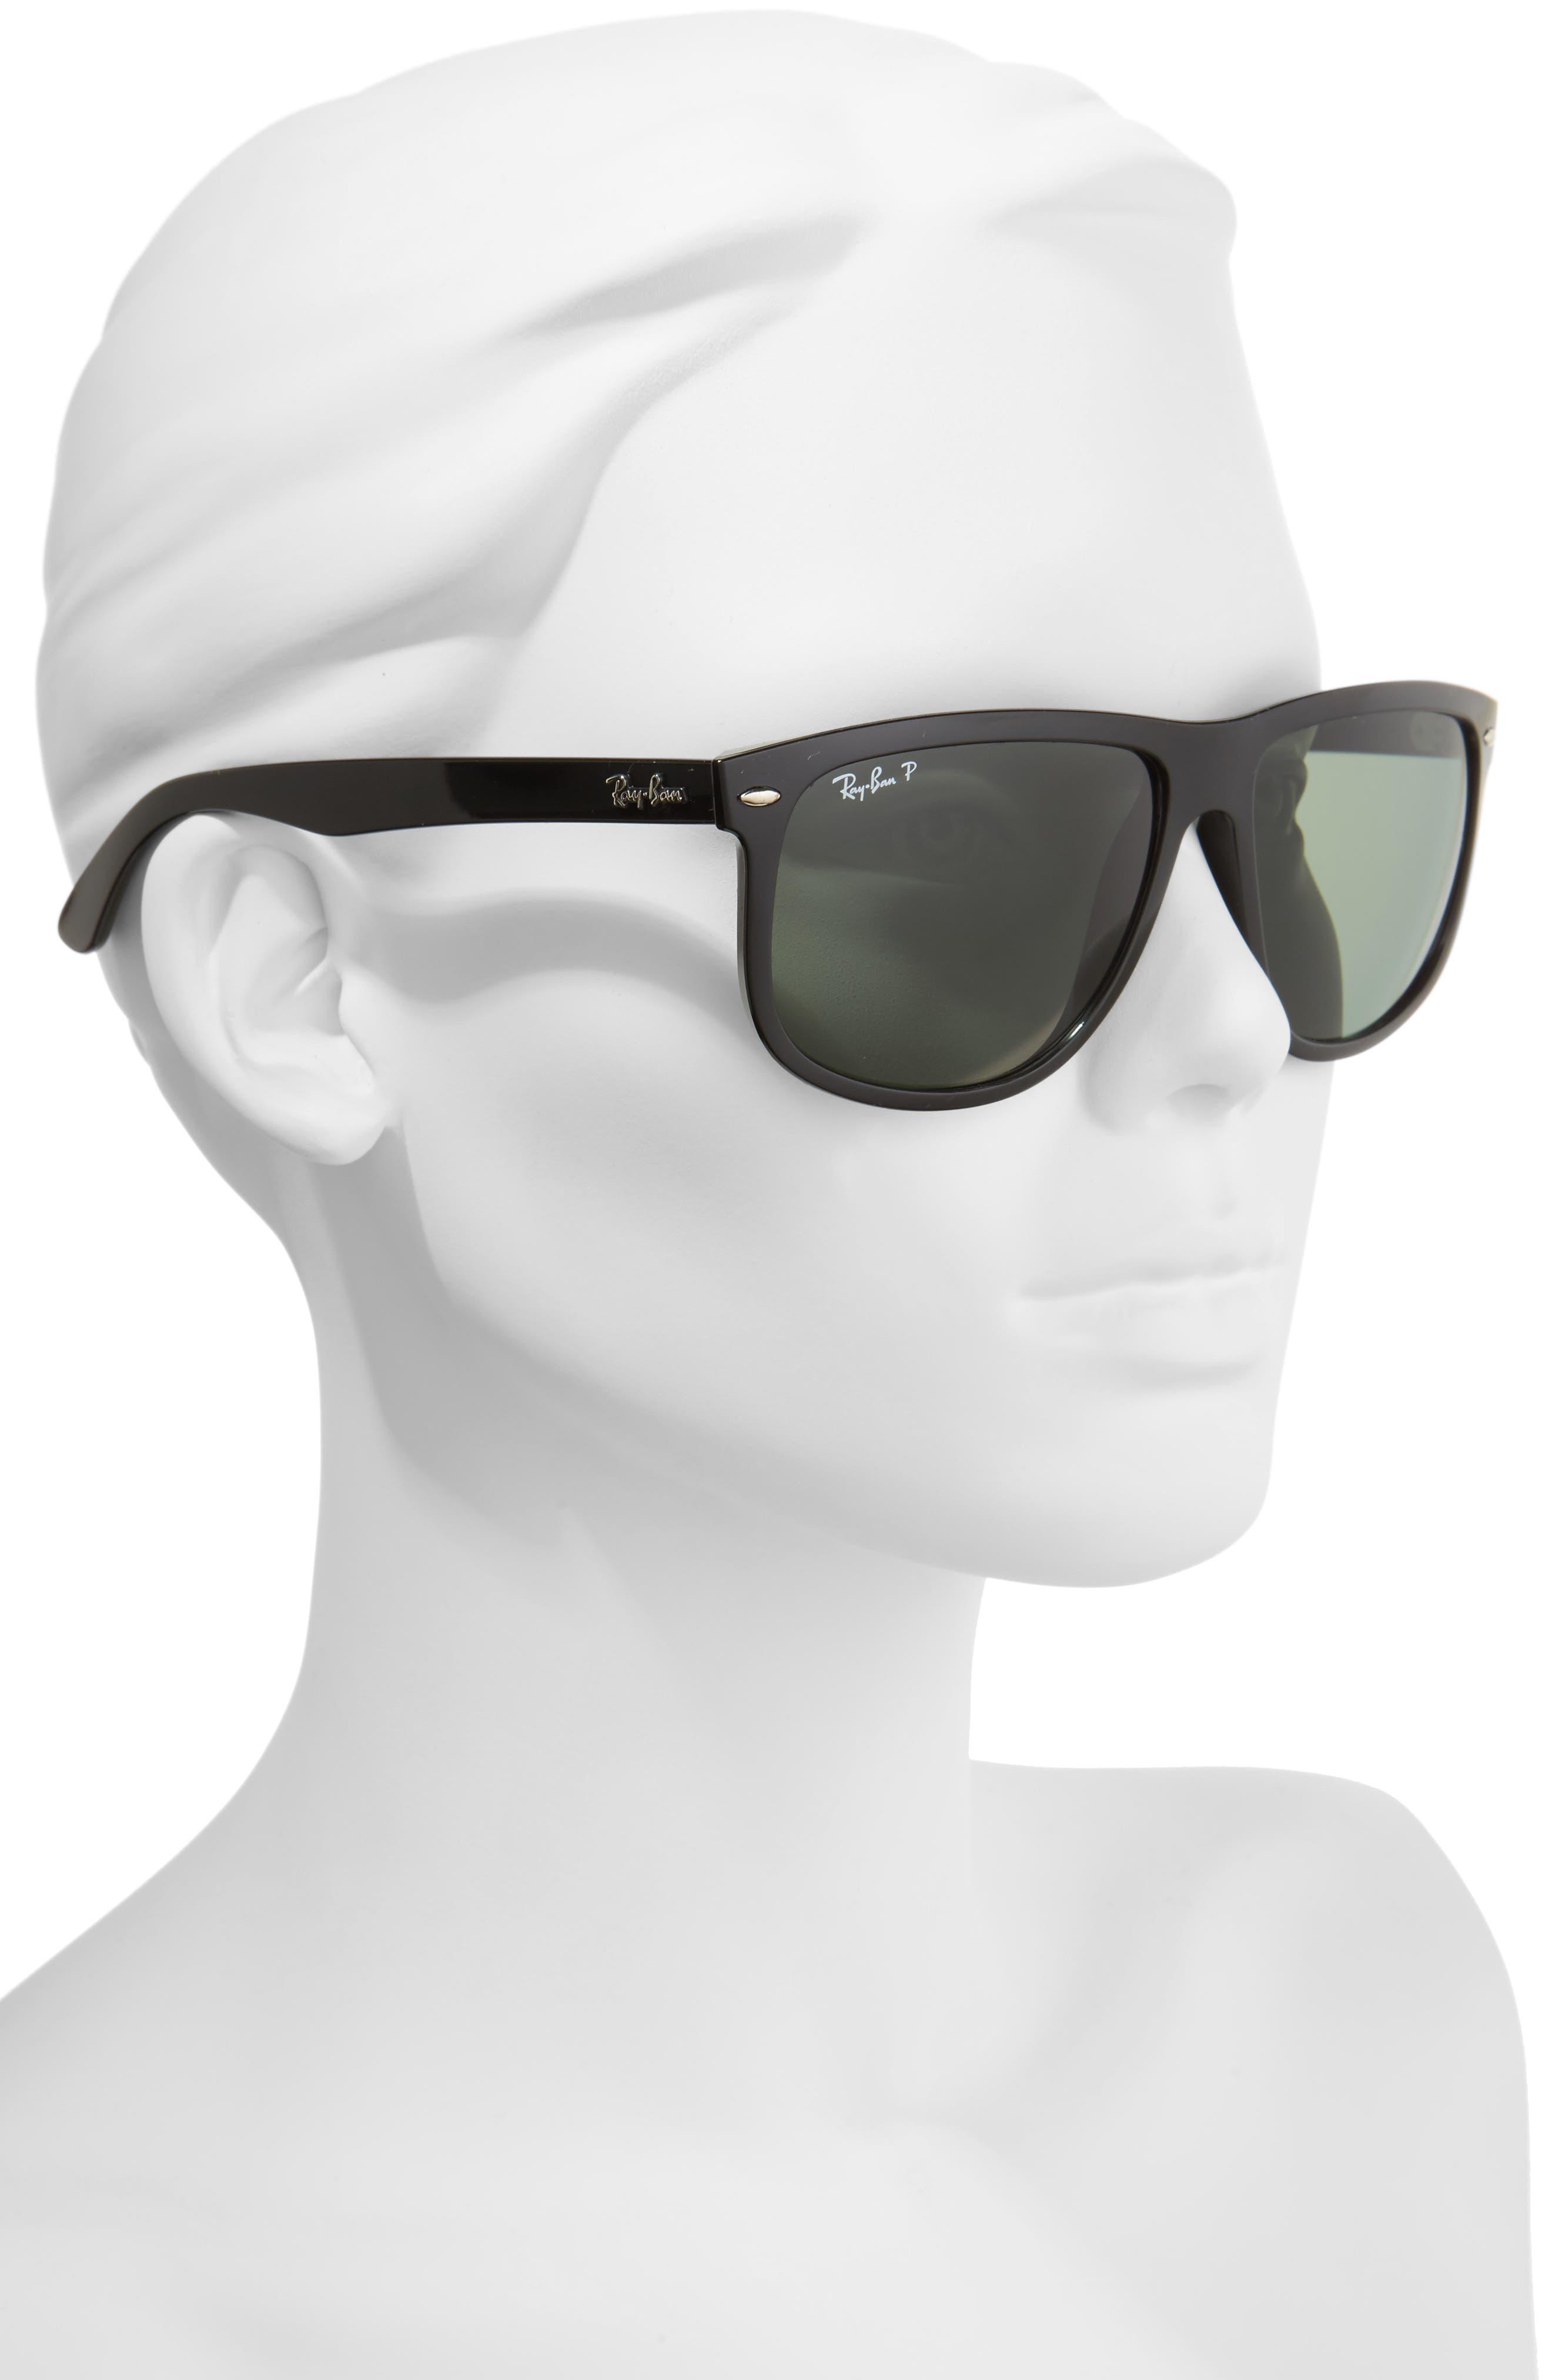 RAY-BAN, Highstreet 60mm Polarized Flat Top Sunglasses, Alternate thumbnail 3, color, BLACK POLARIZED